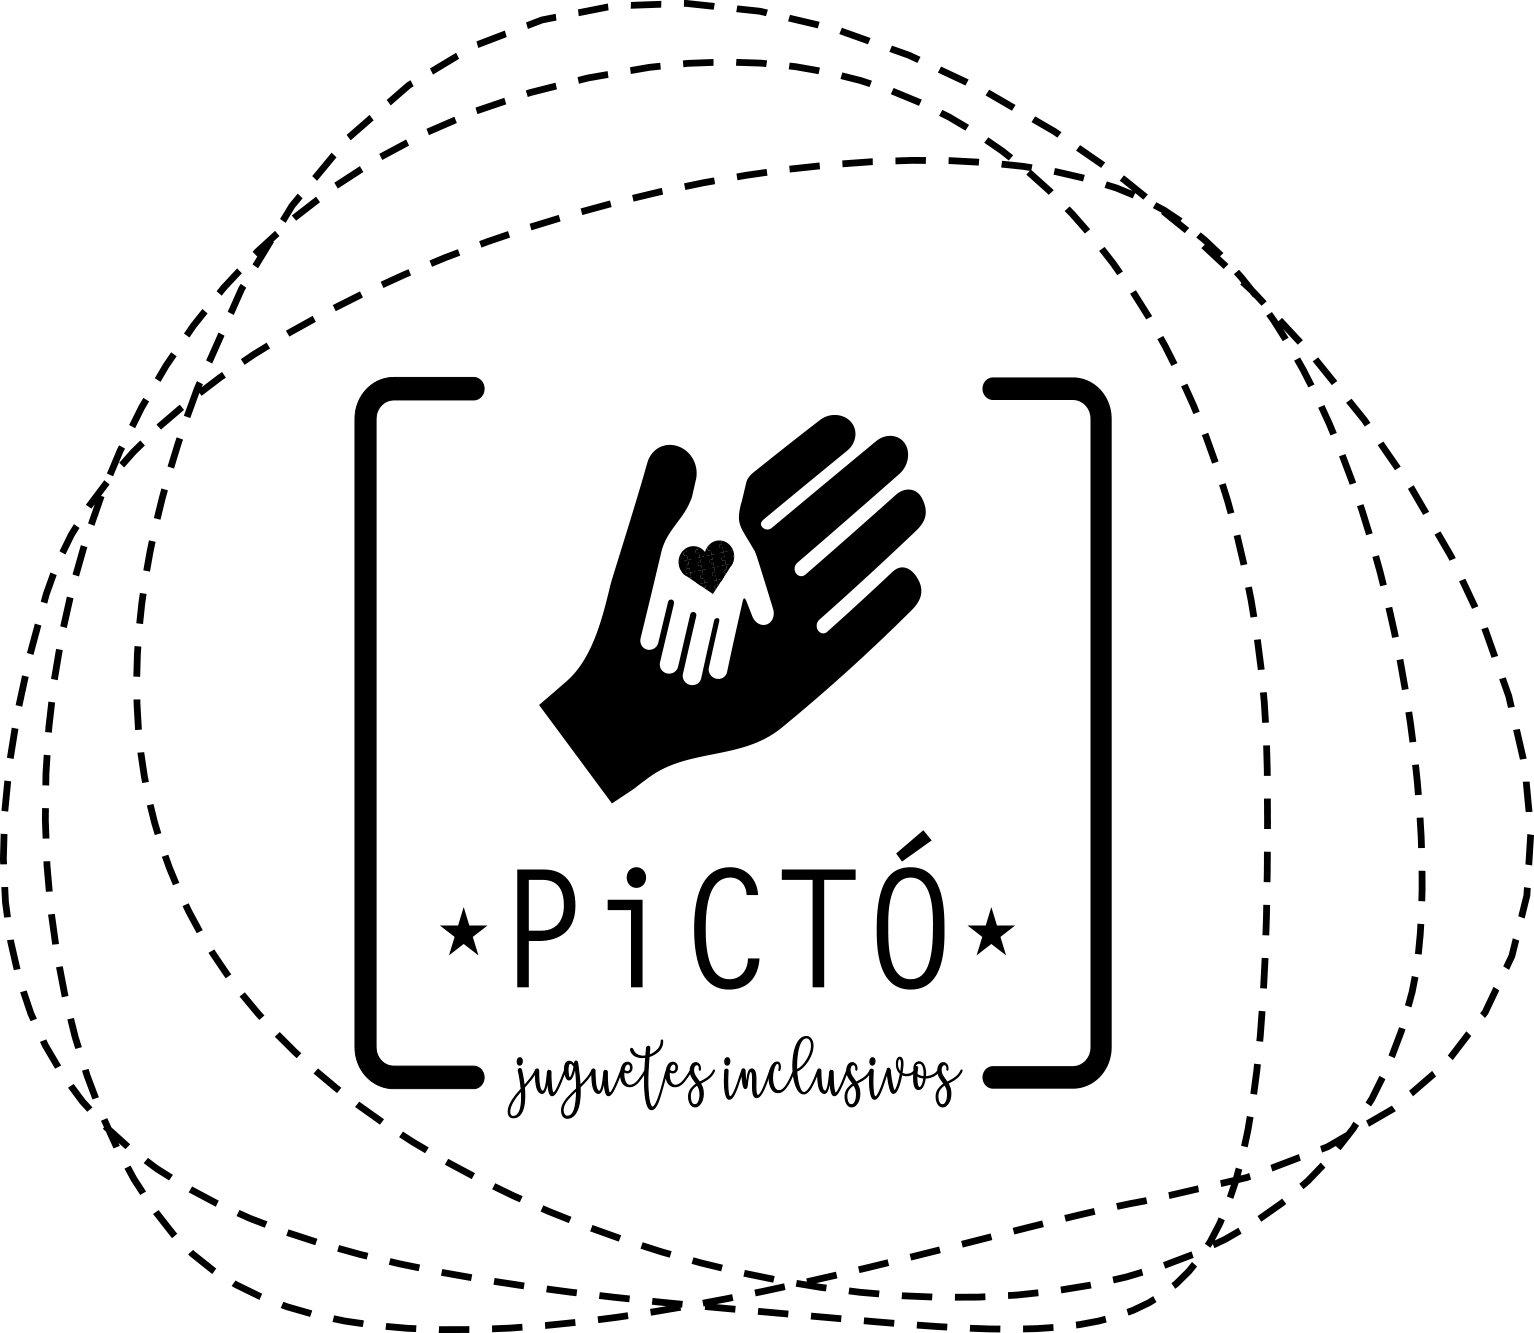 Libro Movil Frases Comprar En Picto